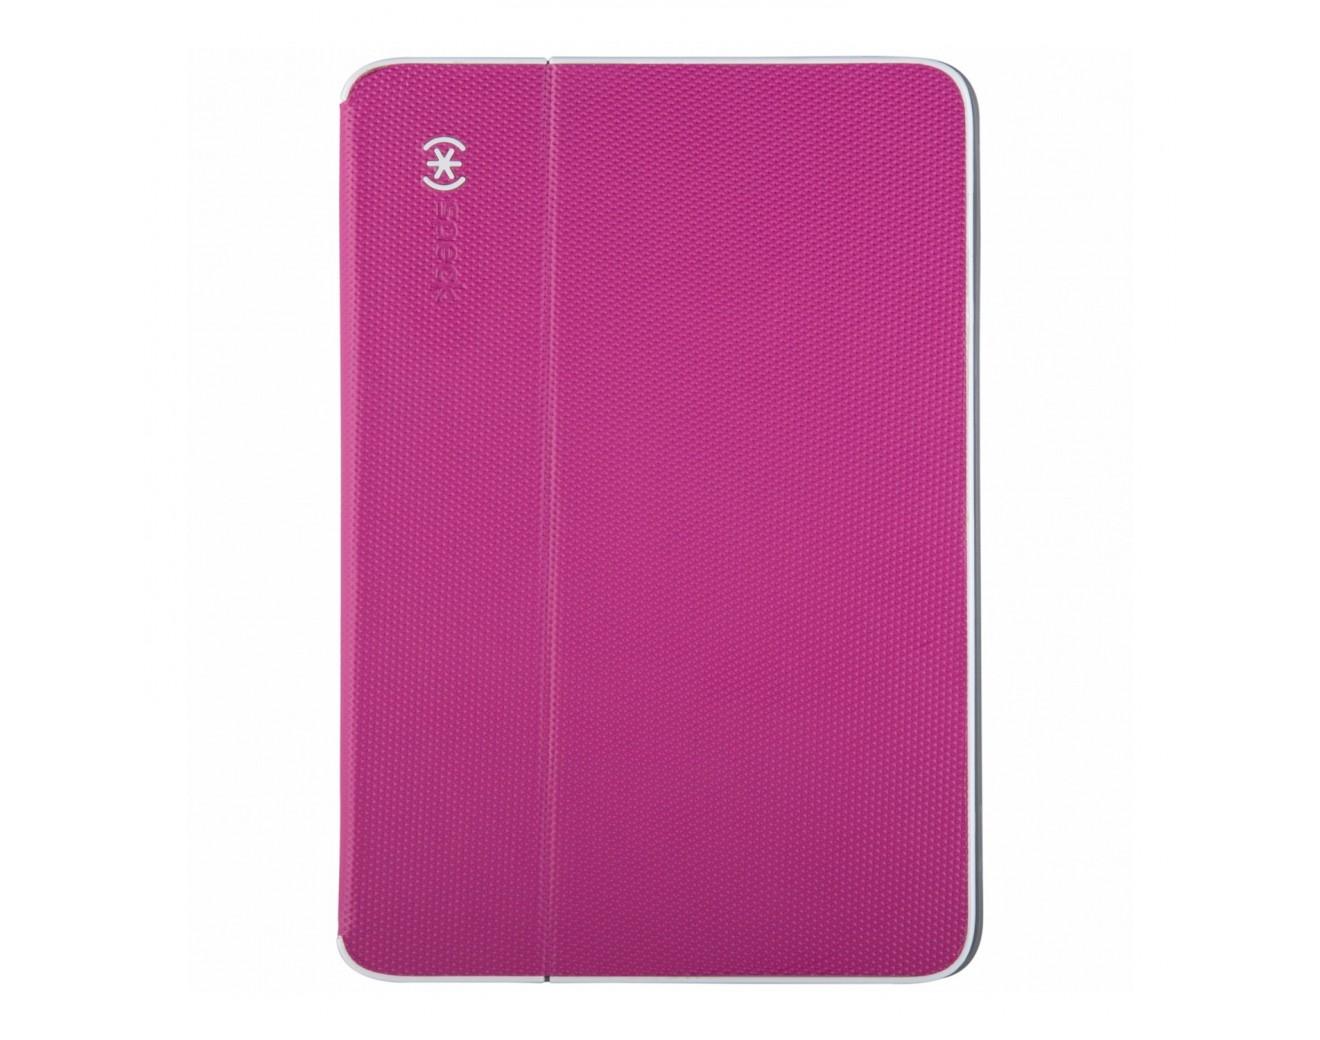 Калъф SPECK DuraFolio iPad Air - Fuchsia Pink/White